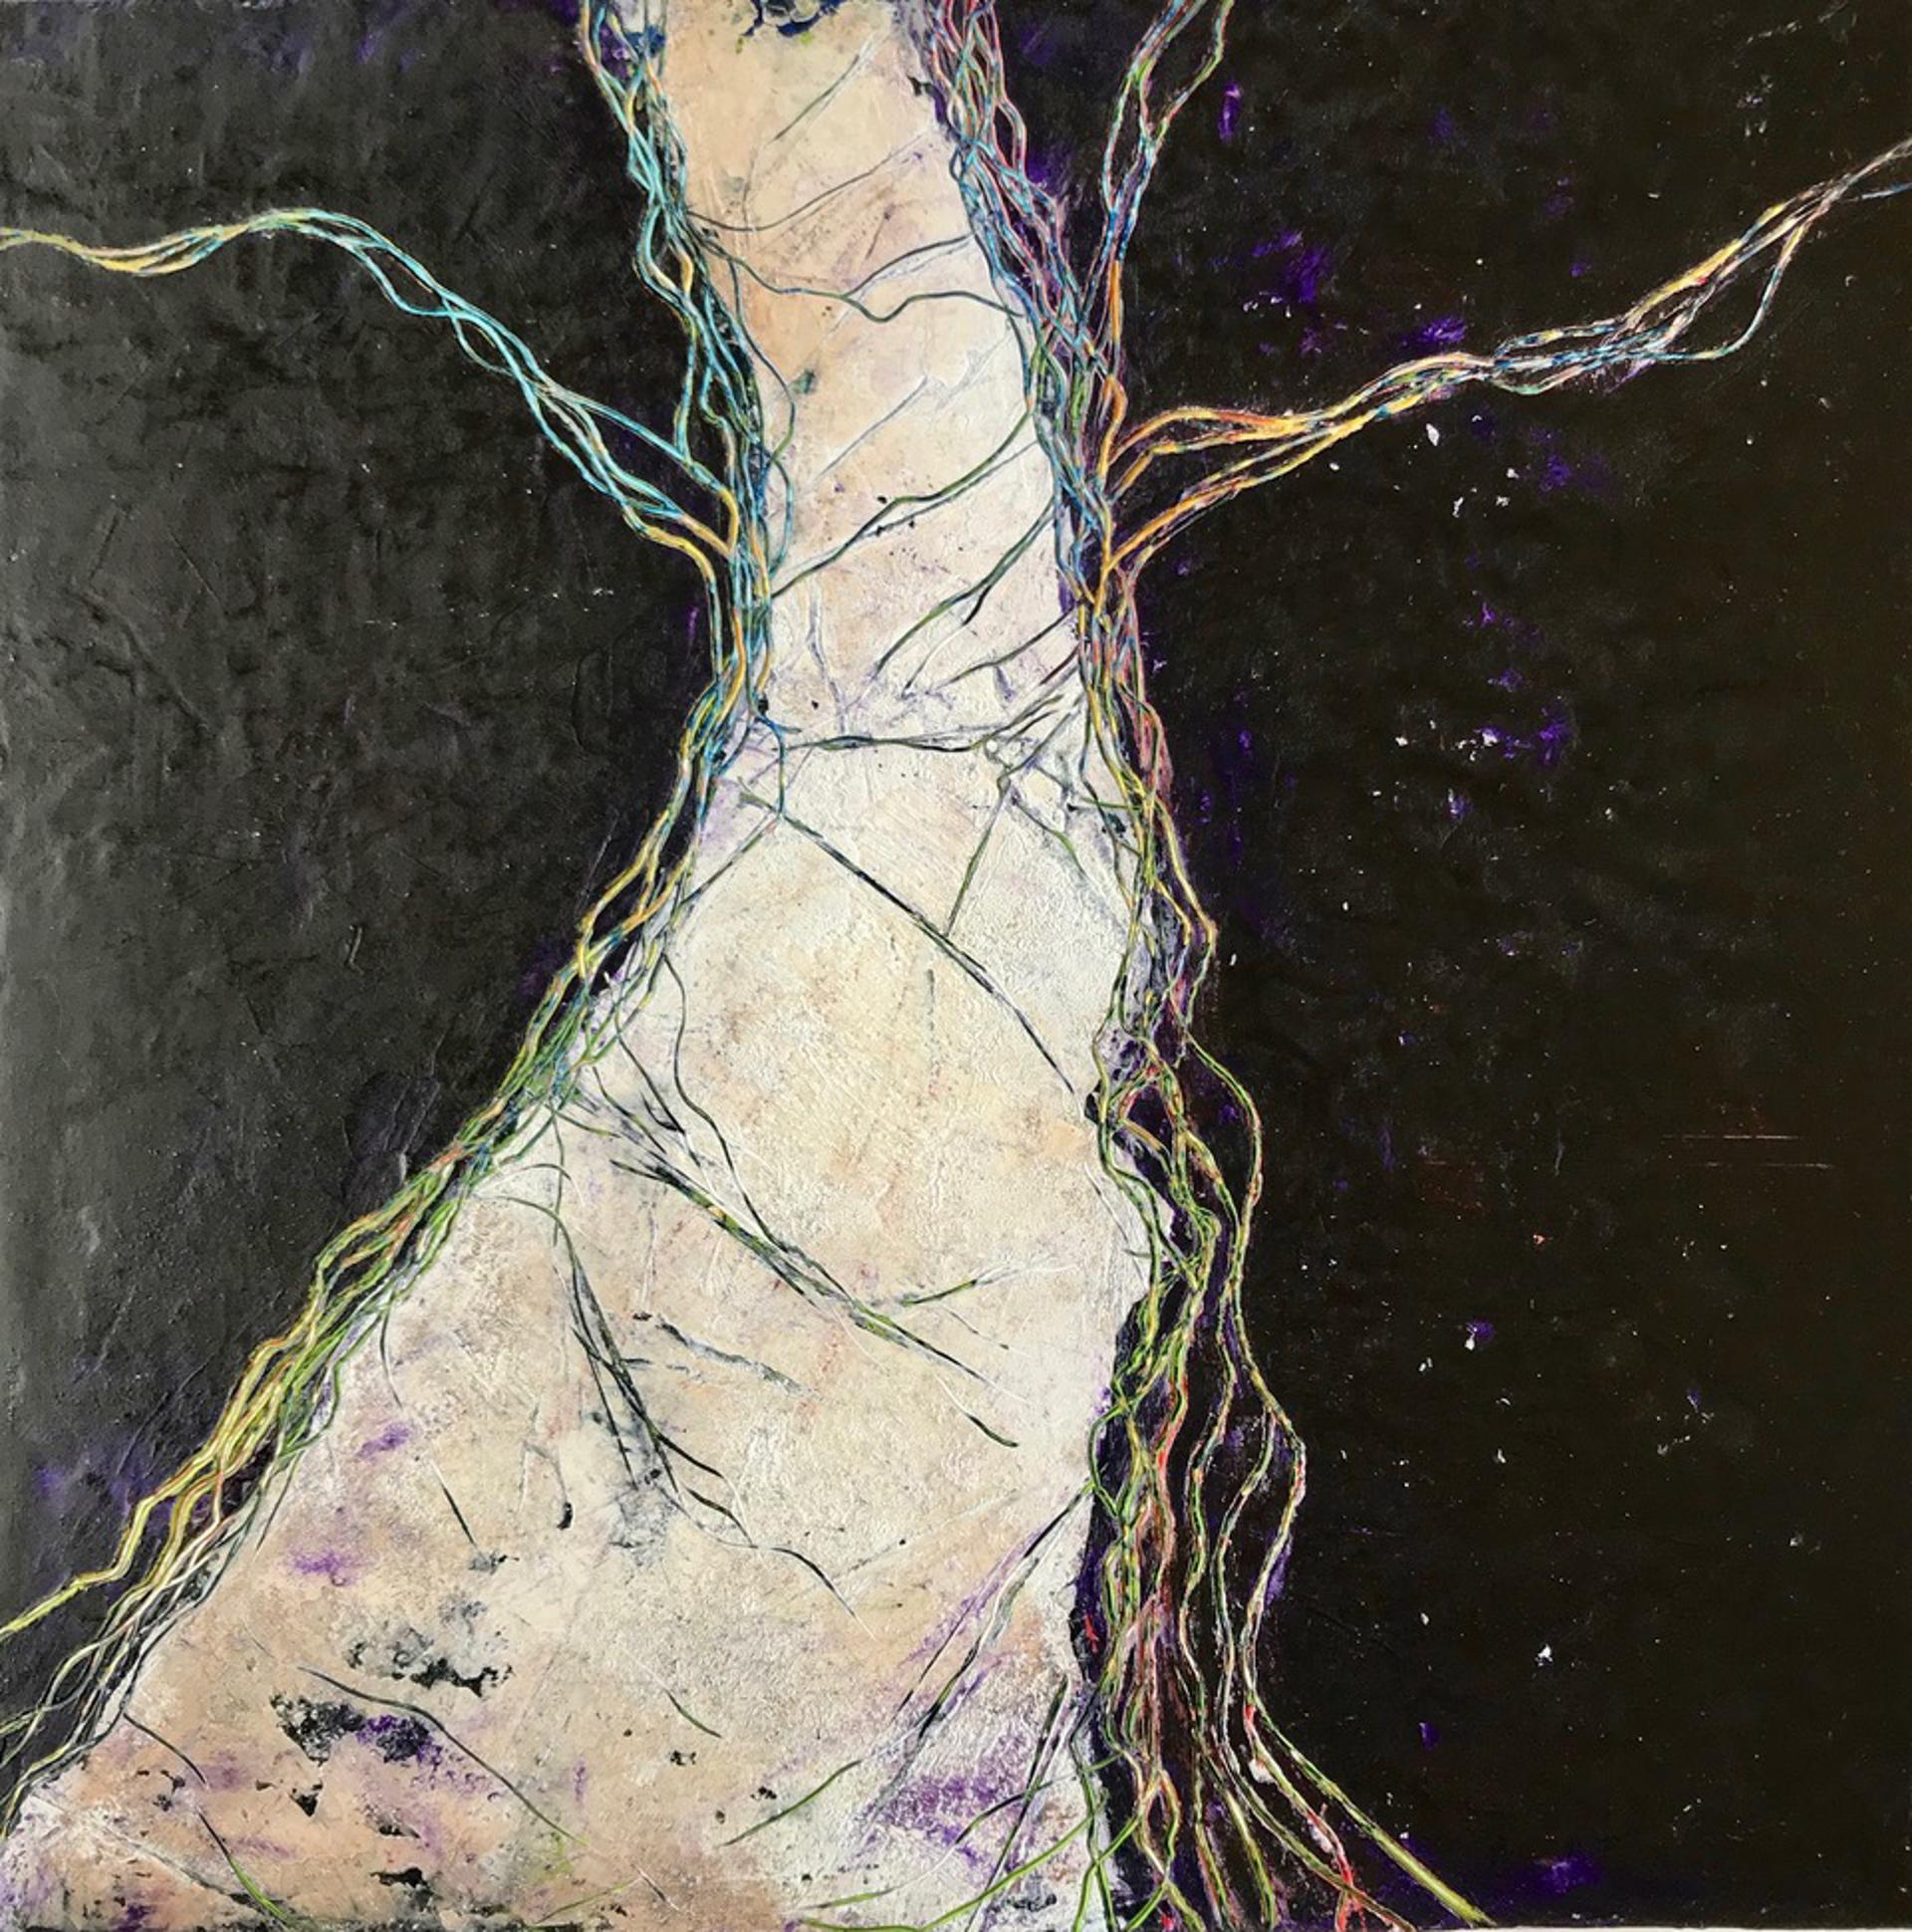 Abstract #10 by Lori Elliott-Bartle